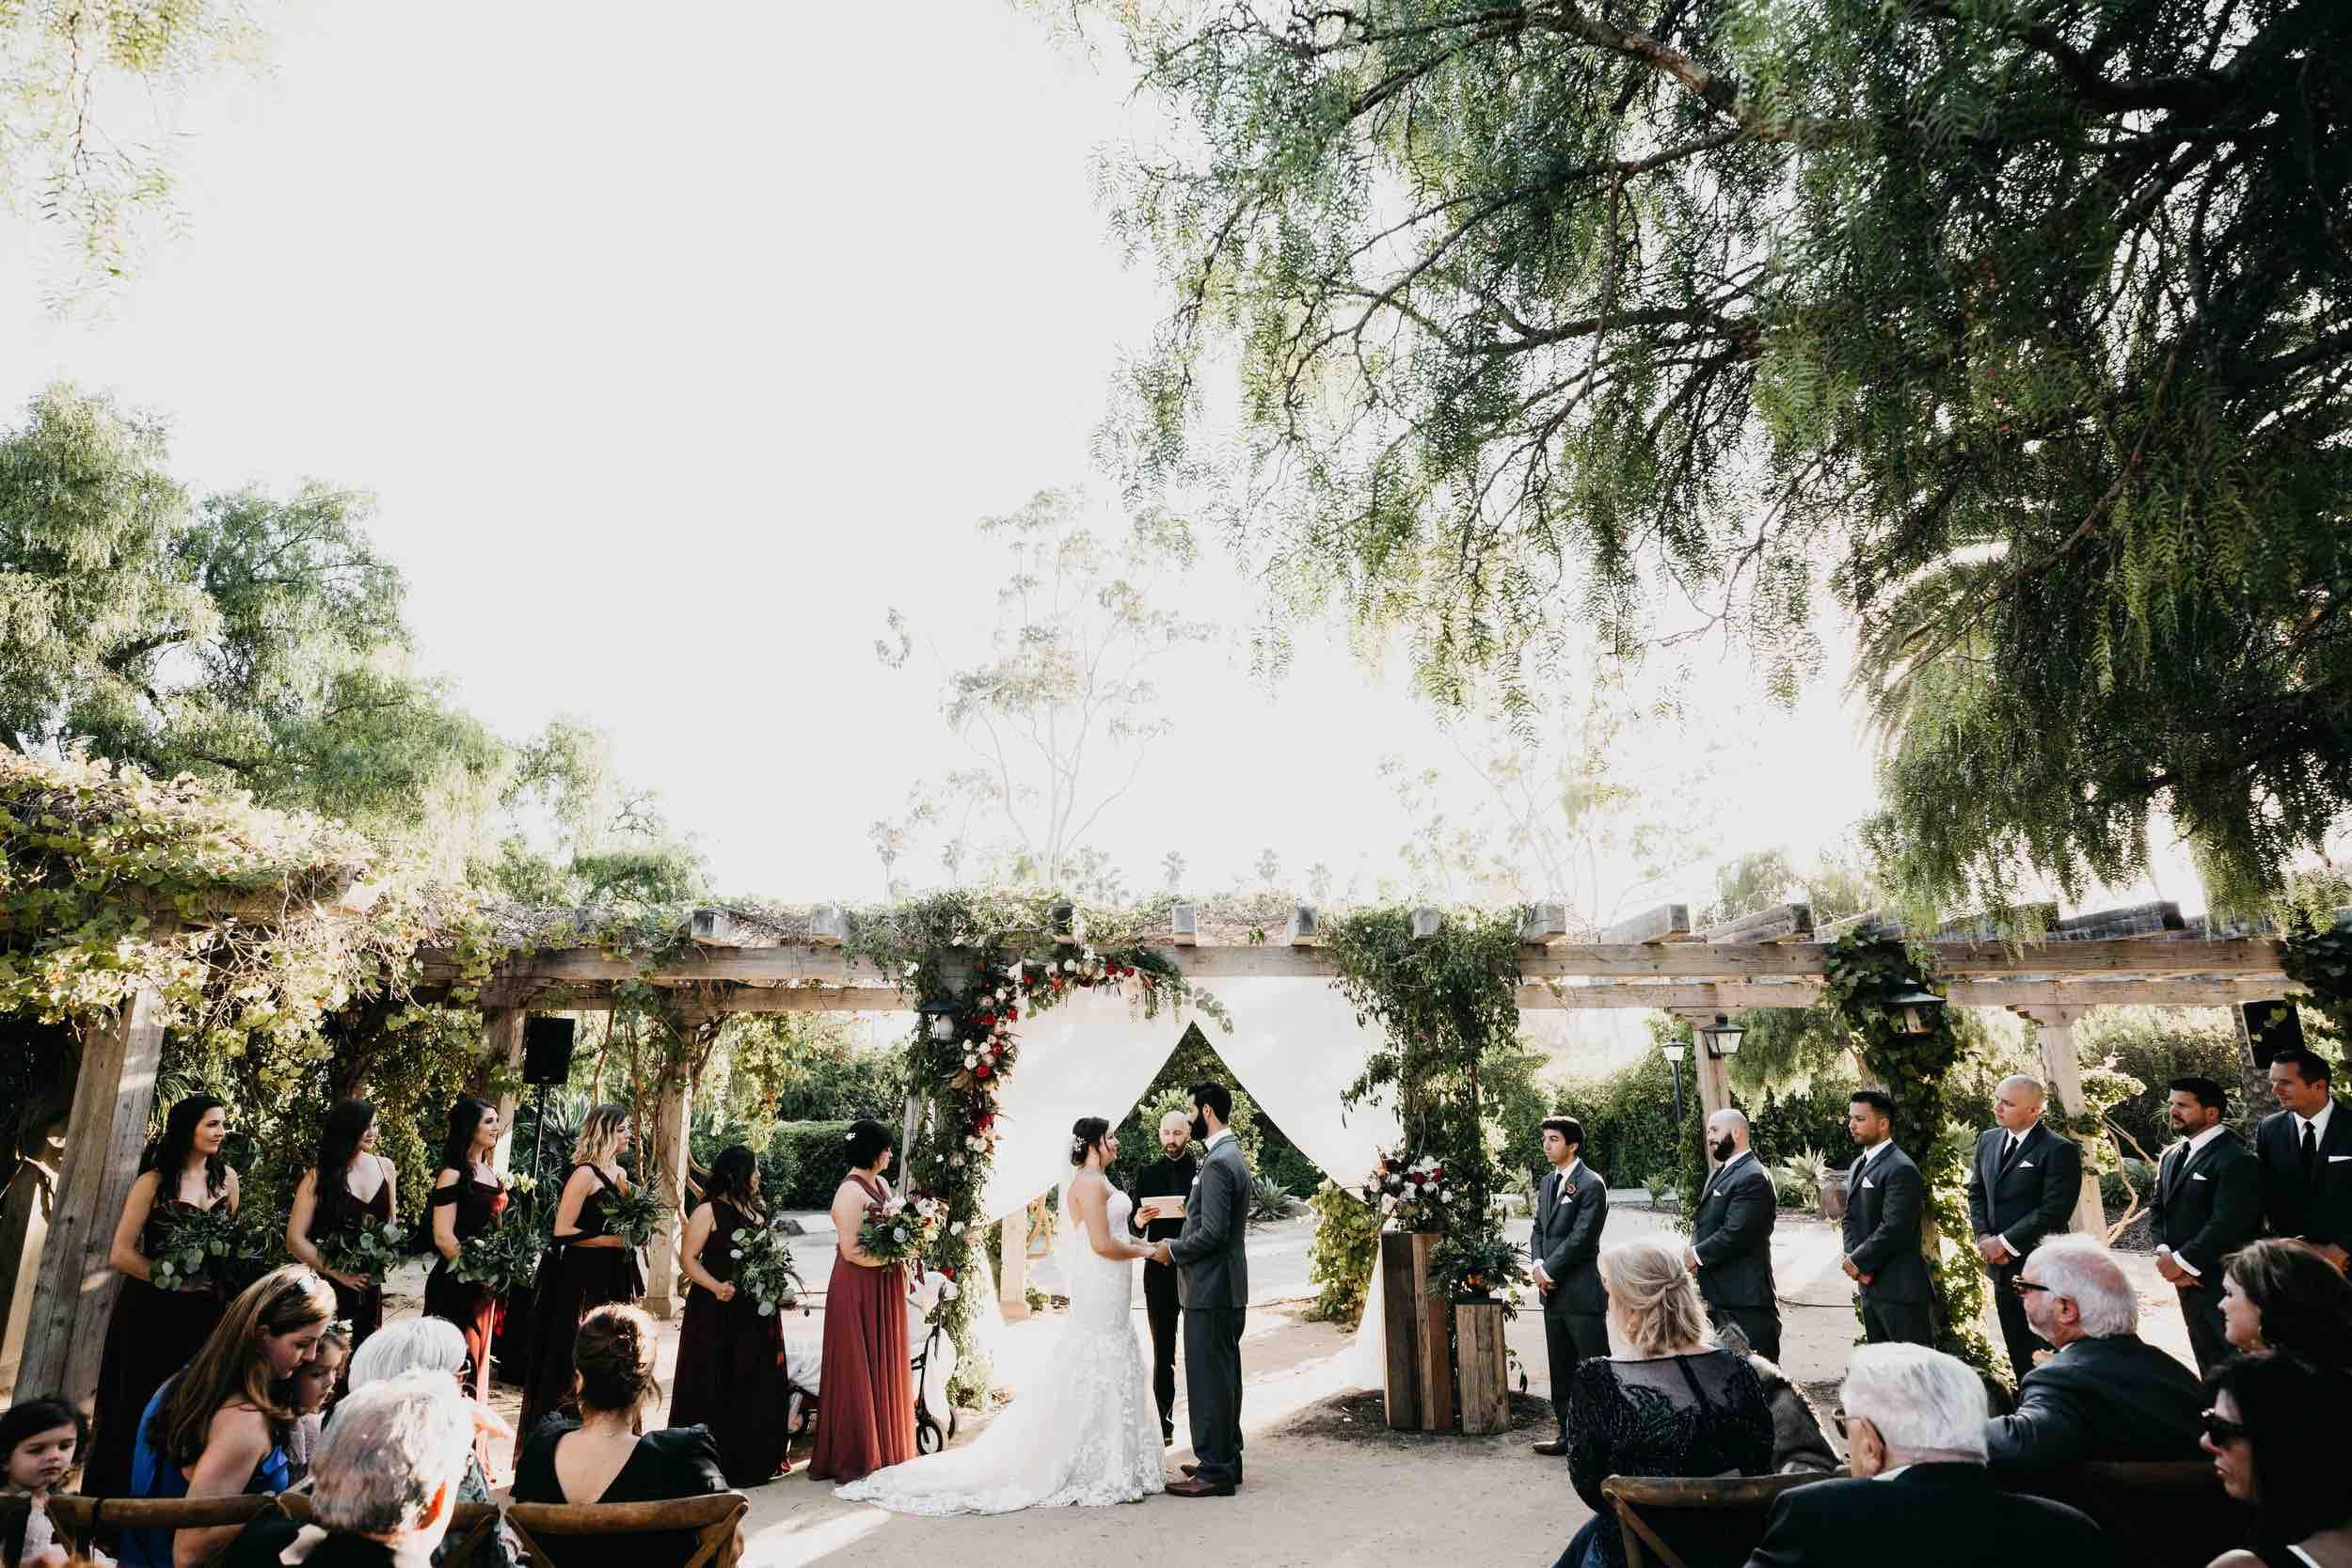 LaurenandSam_Ceremony203.jpeg